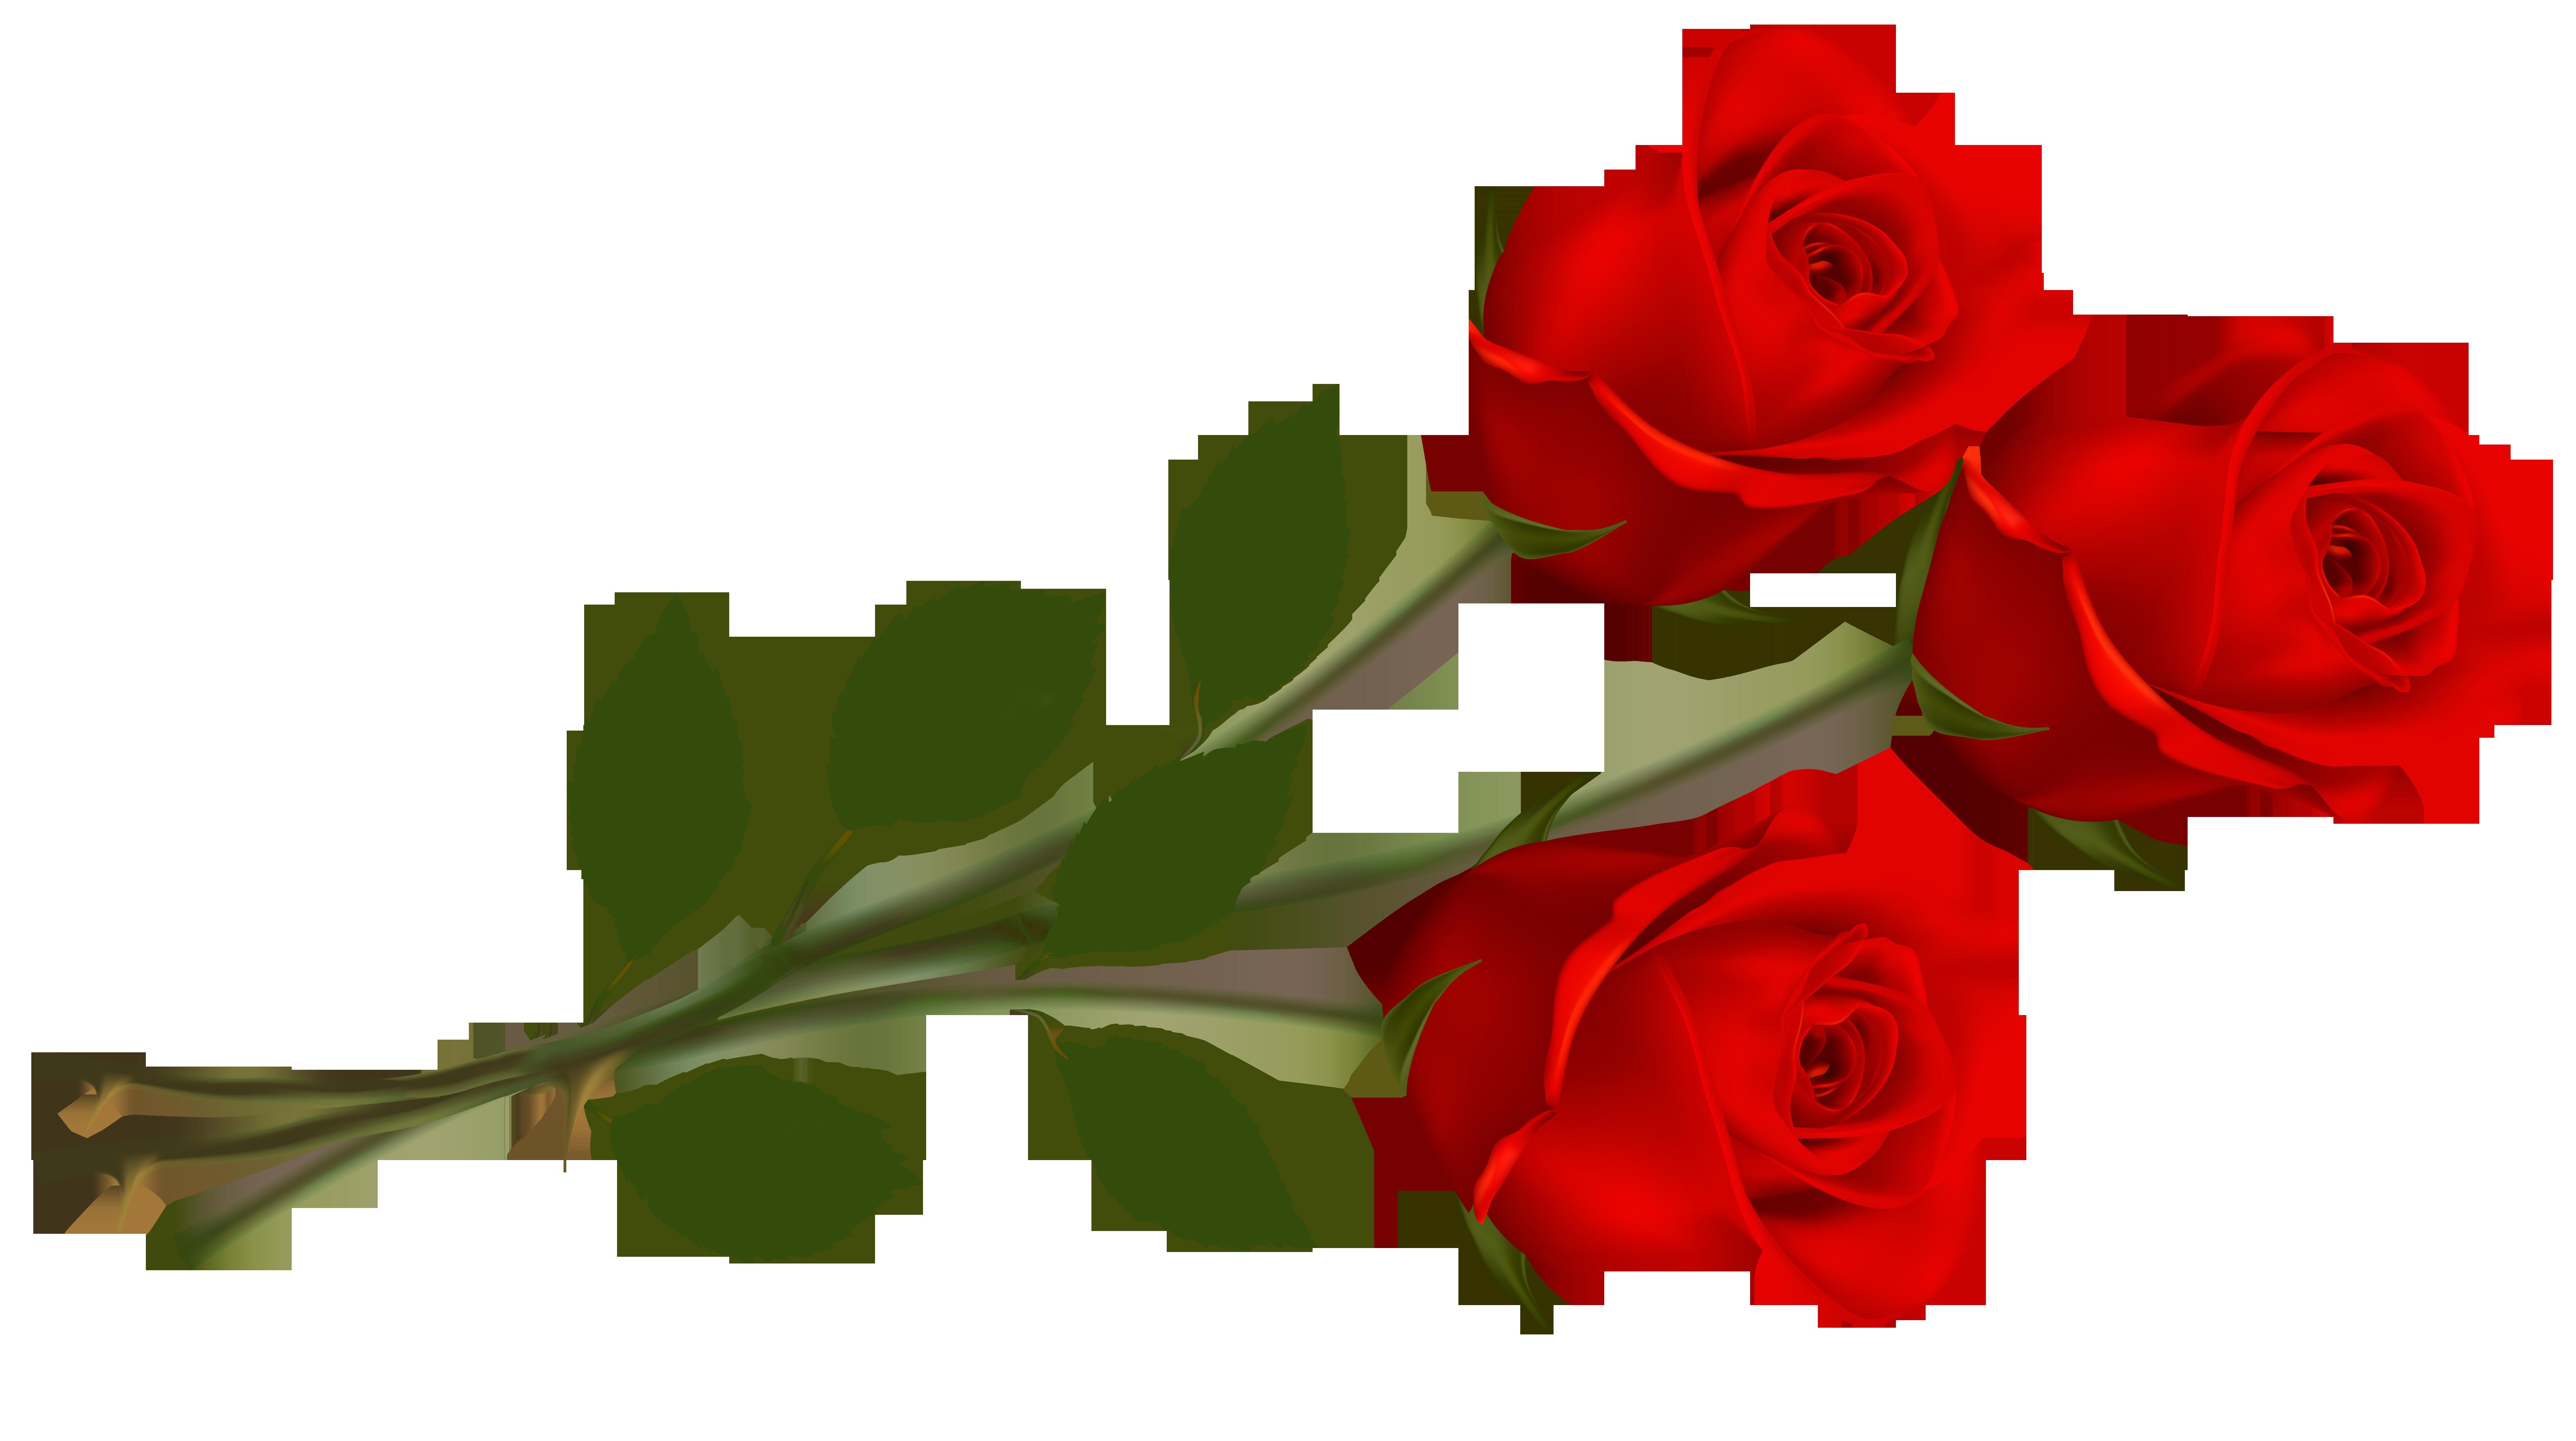 Single Red Rose Clip Art. 499337e244c631-Single Red Rose Clip Art. 499337e244c63137fac26c208707e6 .-15